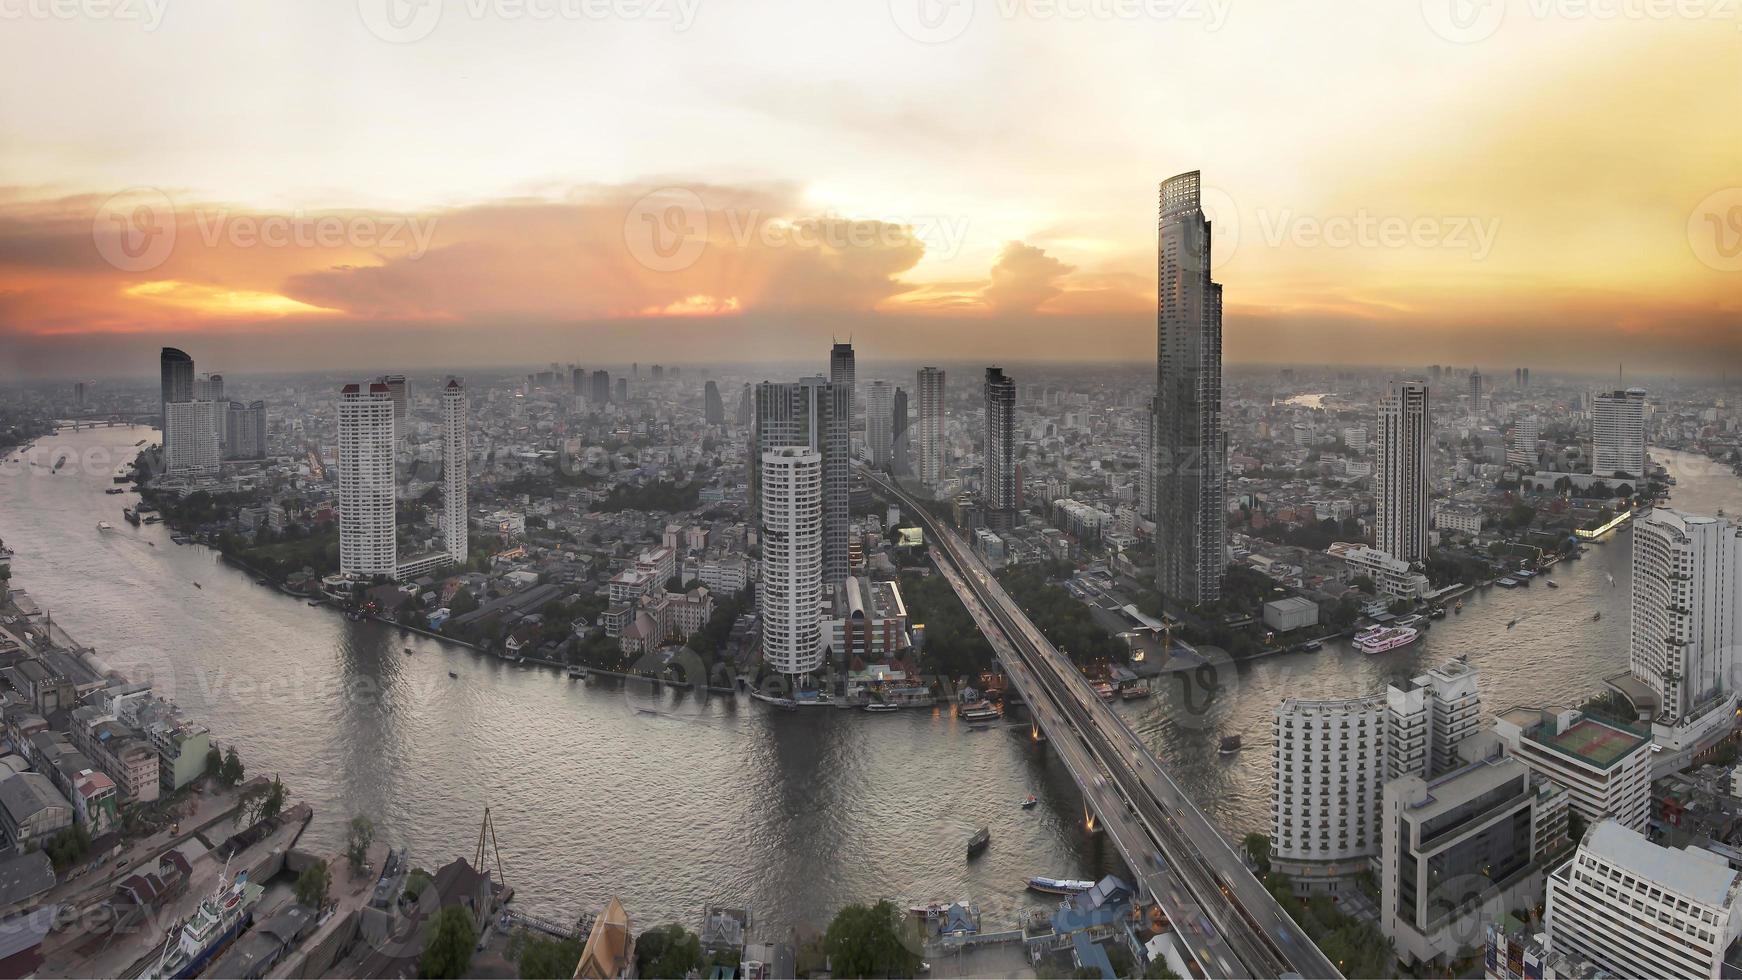 luchtfoto van bangkok avond op de wolkenkrabbers in de binnenstad. foto